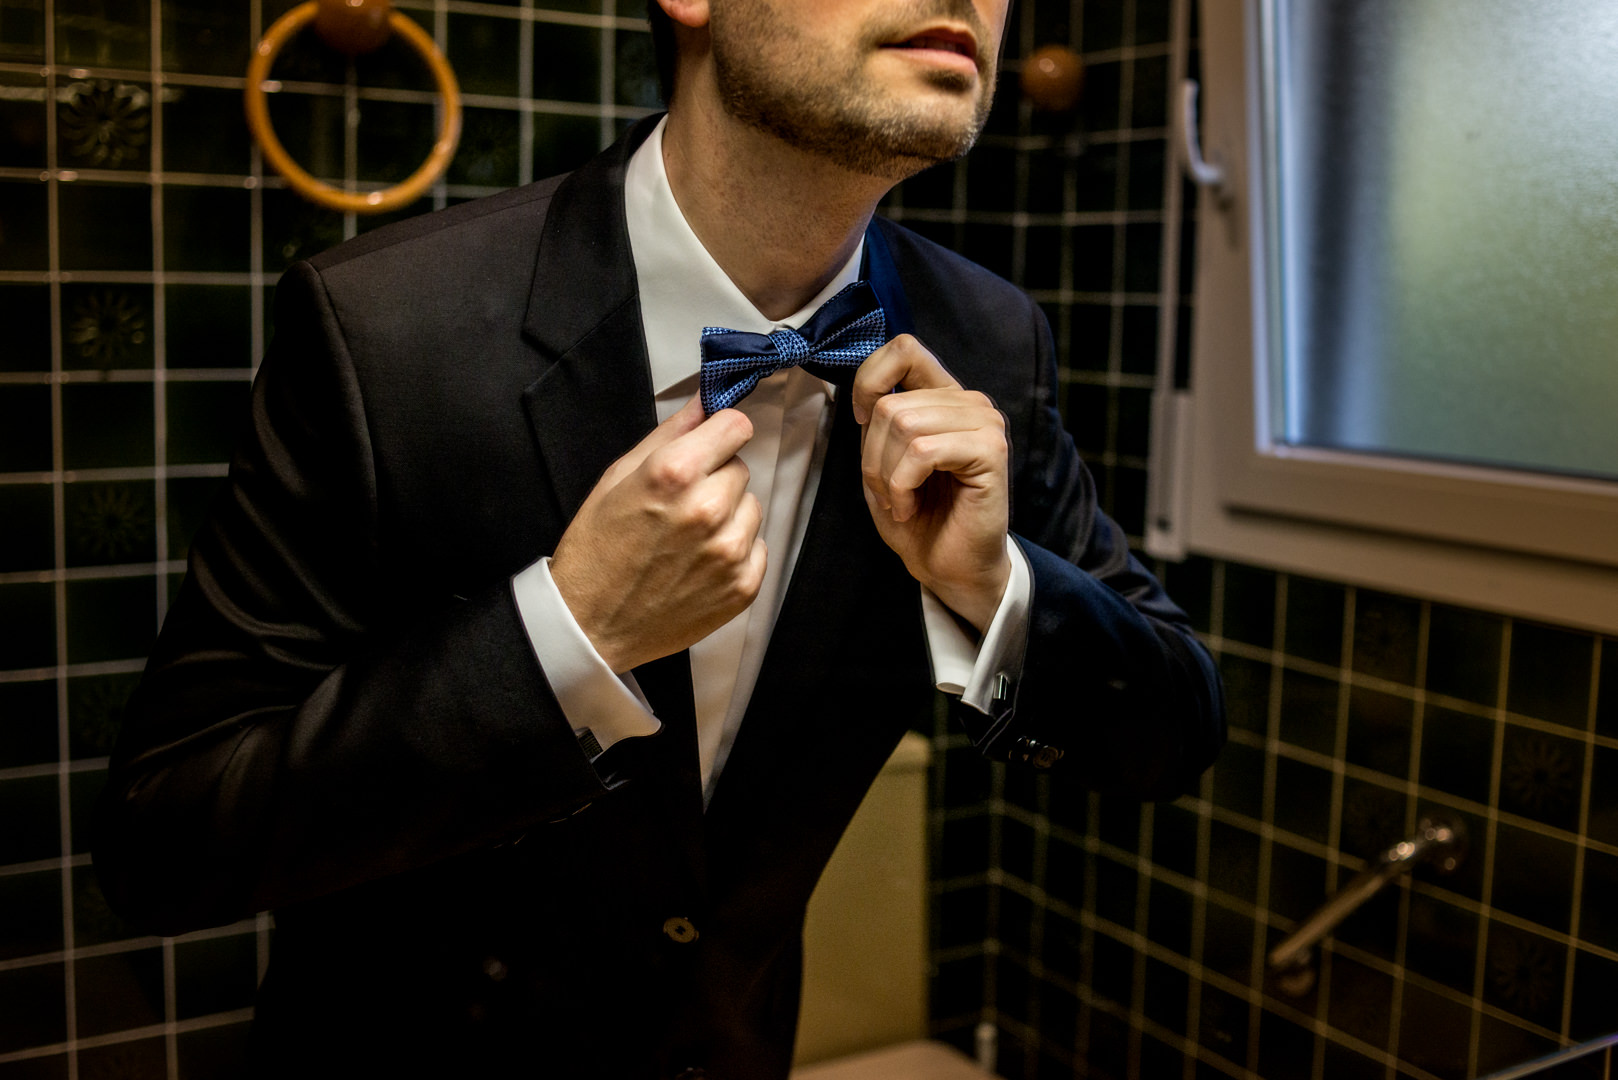 Same-sex-wedding-barcelona-boda- gay-samesex-engagement-Rafael-Torres-fotografo-bodas-sevilla-madrid-barcelona-wedding-photographer--5.jpg